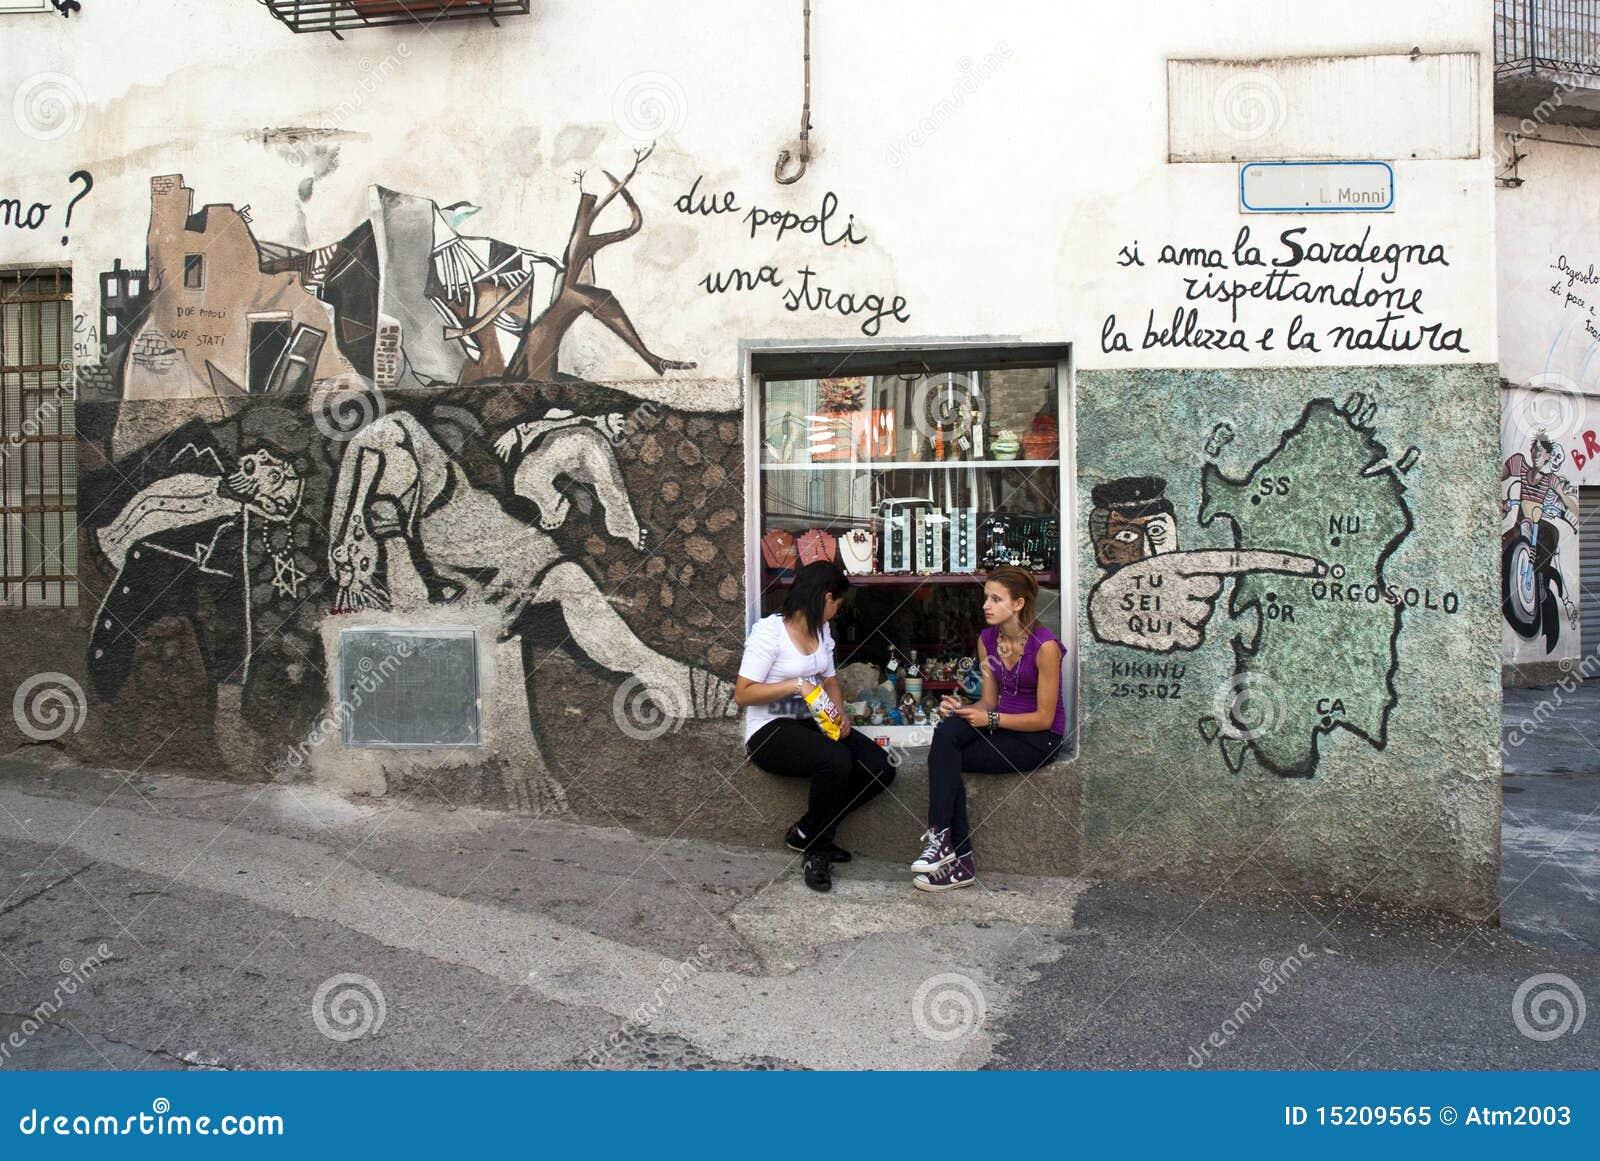 Peintures murales d 39 orgosolo sardaigne image ditorial for Les differents types de peintures murales